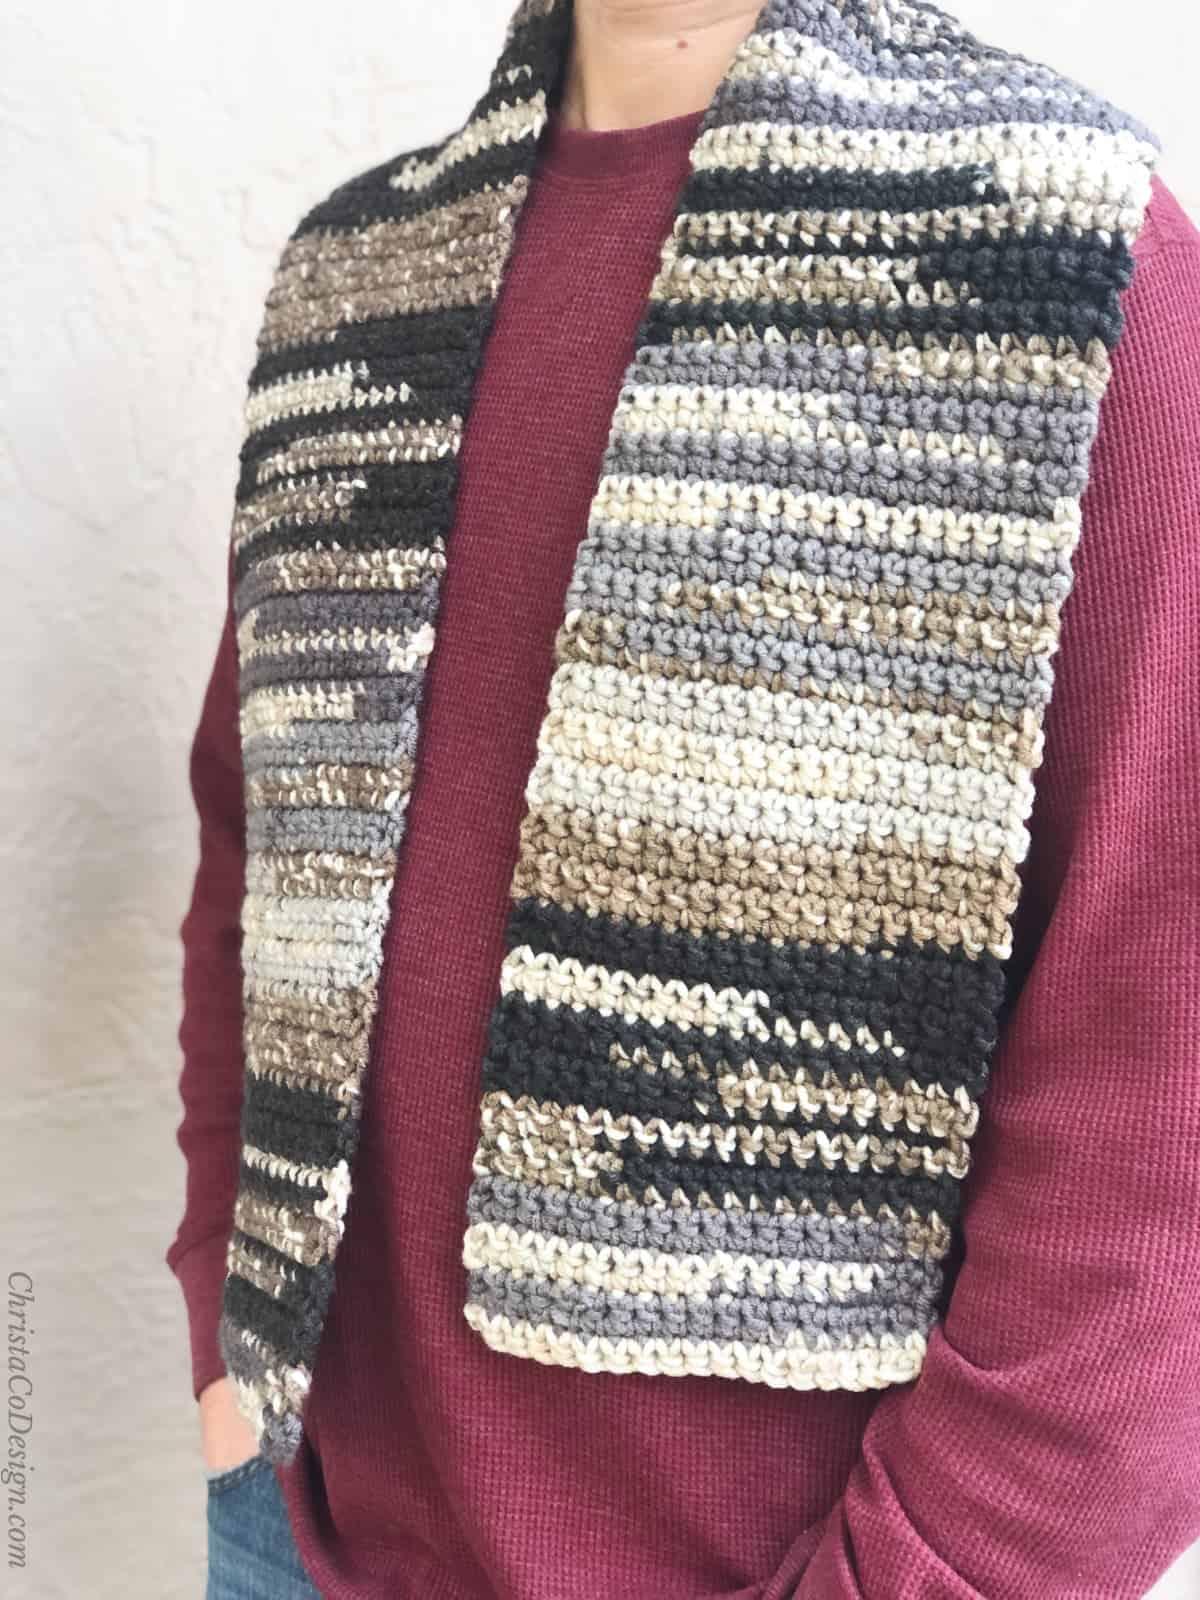 Man wearing black, grey, beige striped scarf.